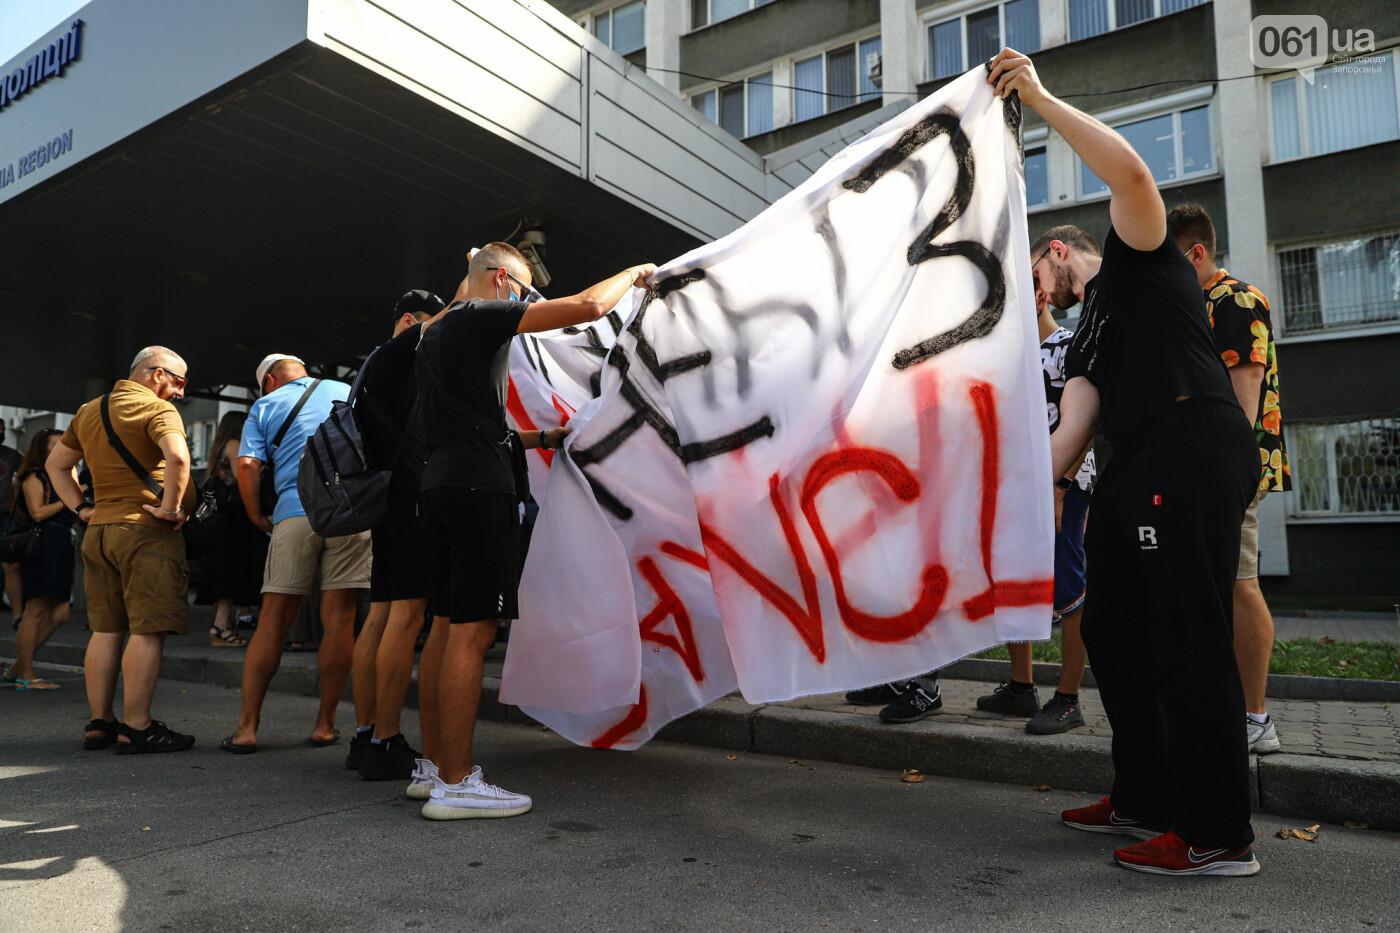 """Захист країни - не злочин"": в Запорожье патриоты провели митинг у стен нацполиции, - ФОТОРЕПОРТАЖ , фото-5"